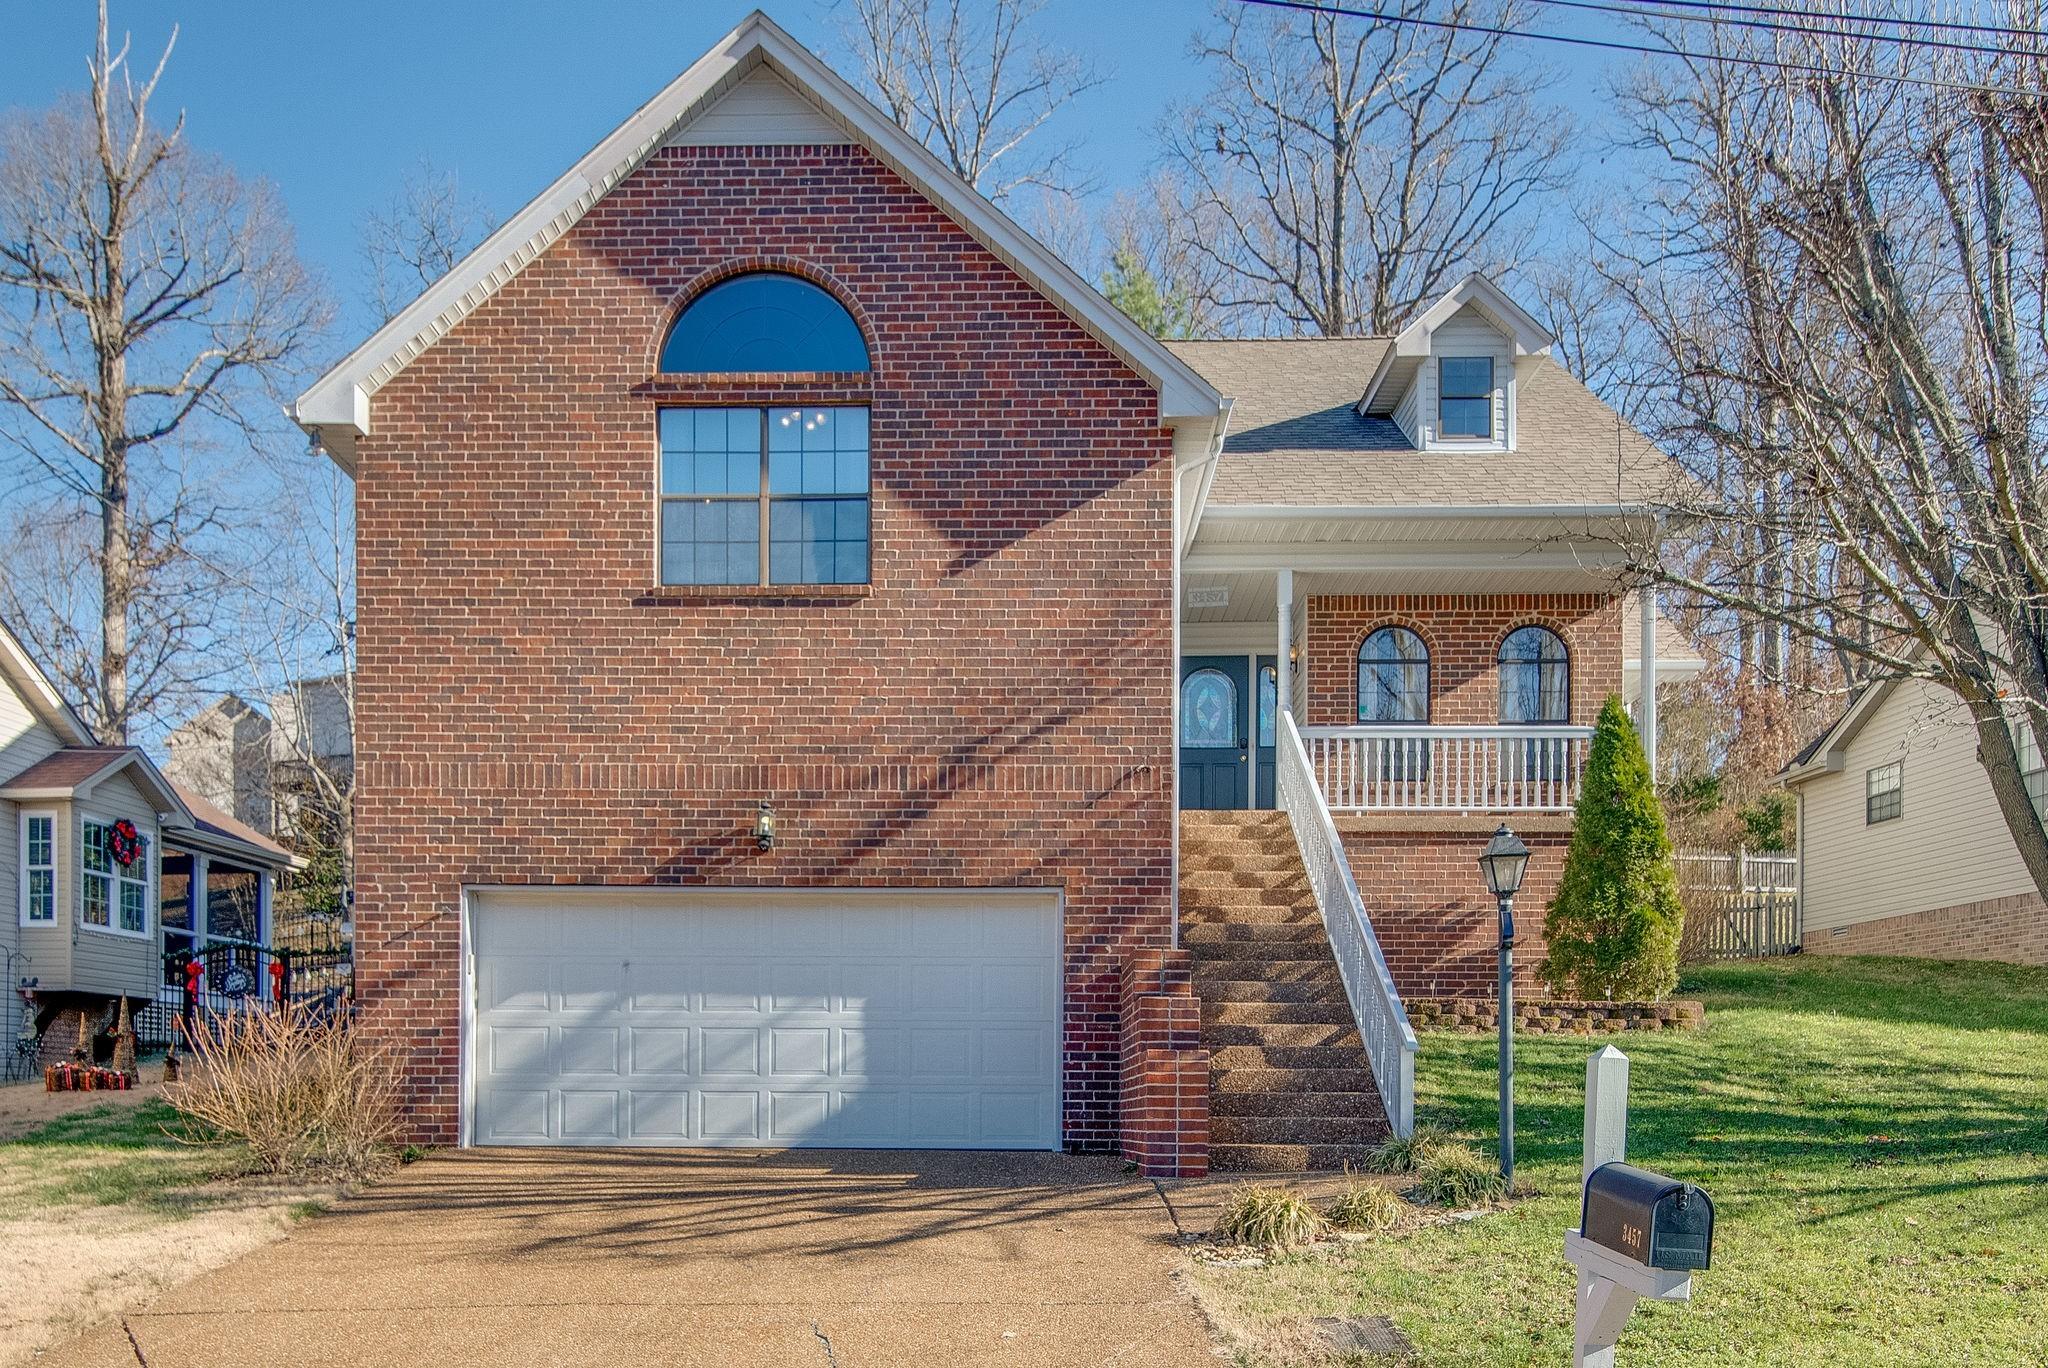 3457 Cobble St, Nashville, TN 37211 - Nashville, TN real estate listing